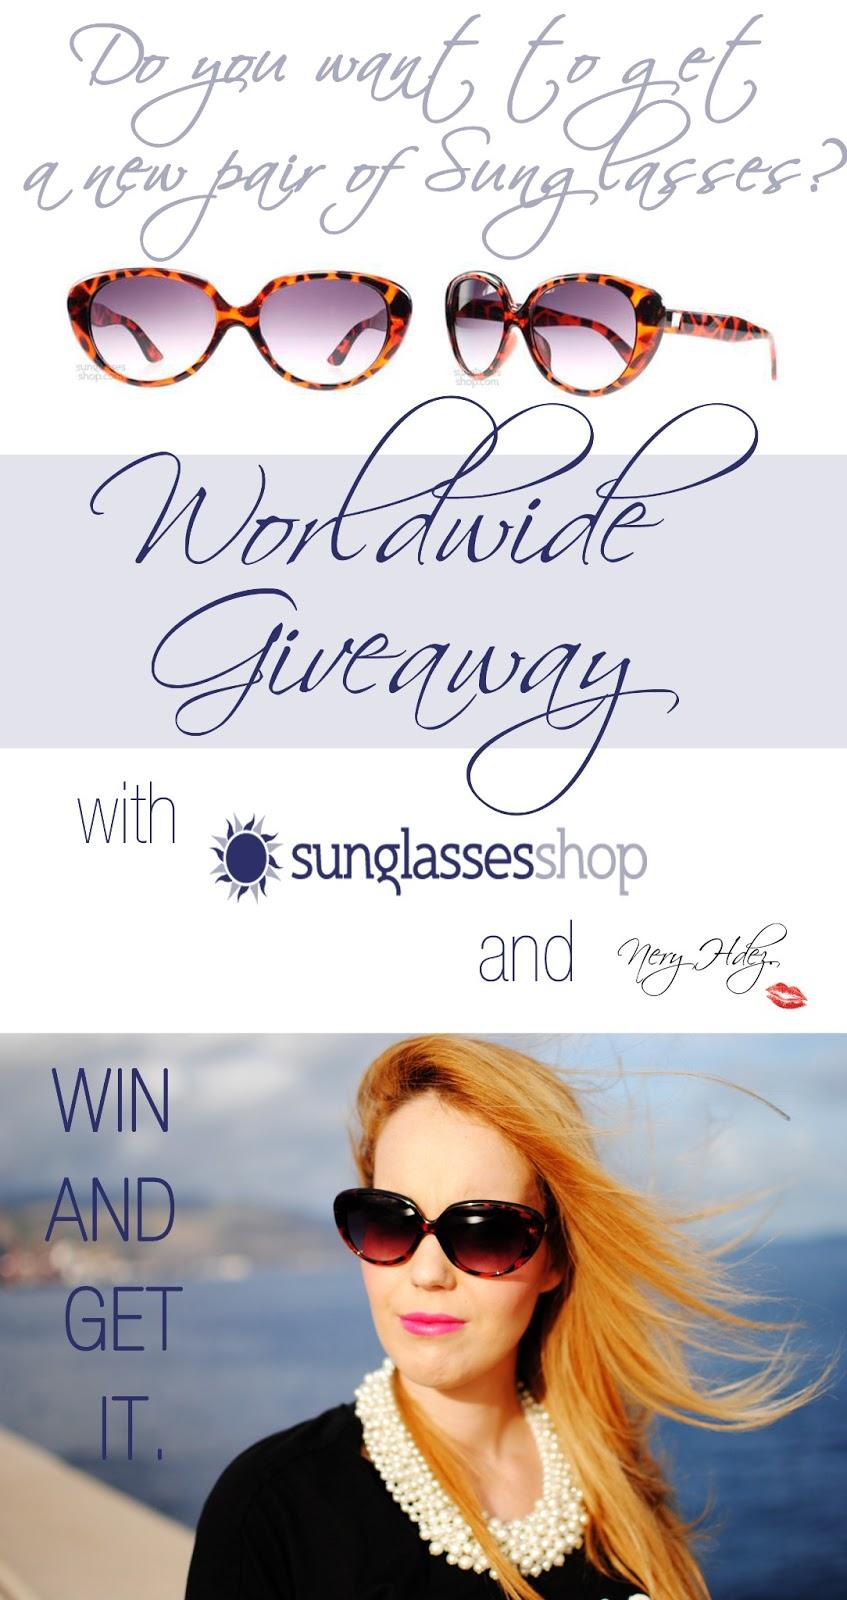 sorteo, sunglasses, giveaway, snb, tenerife, nery hdez